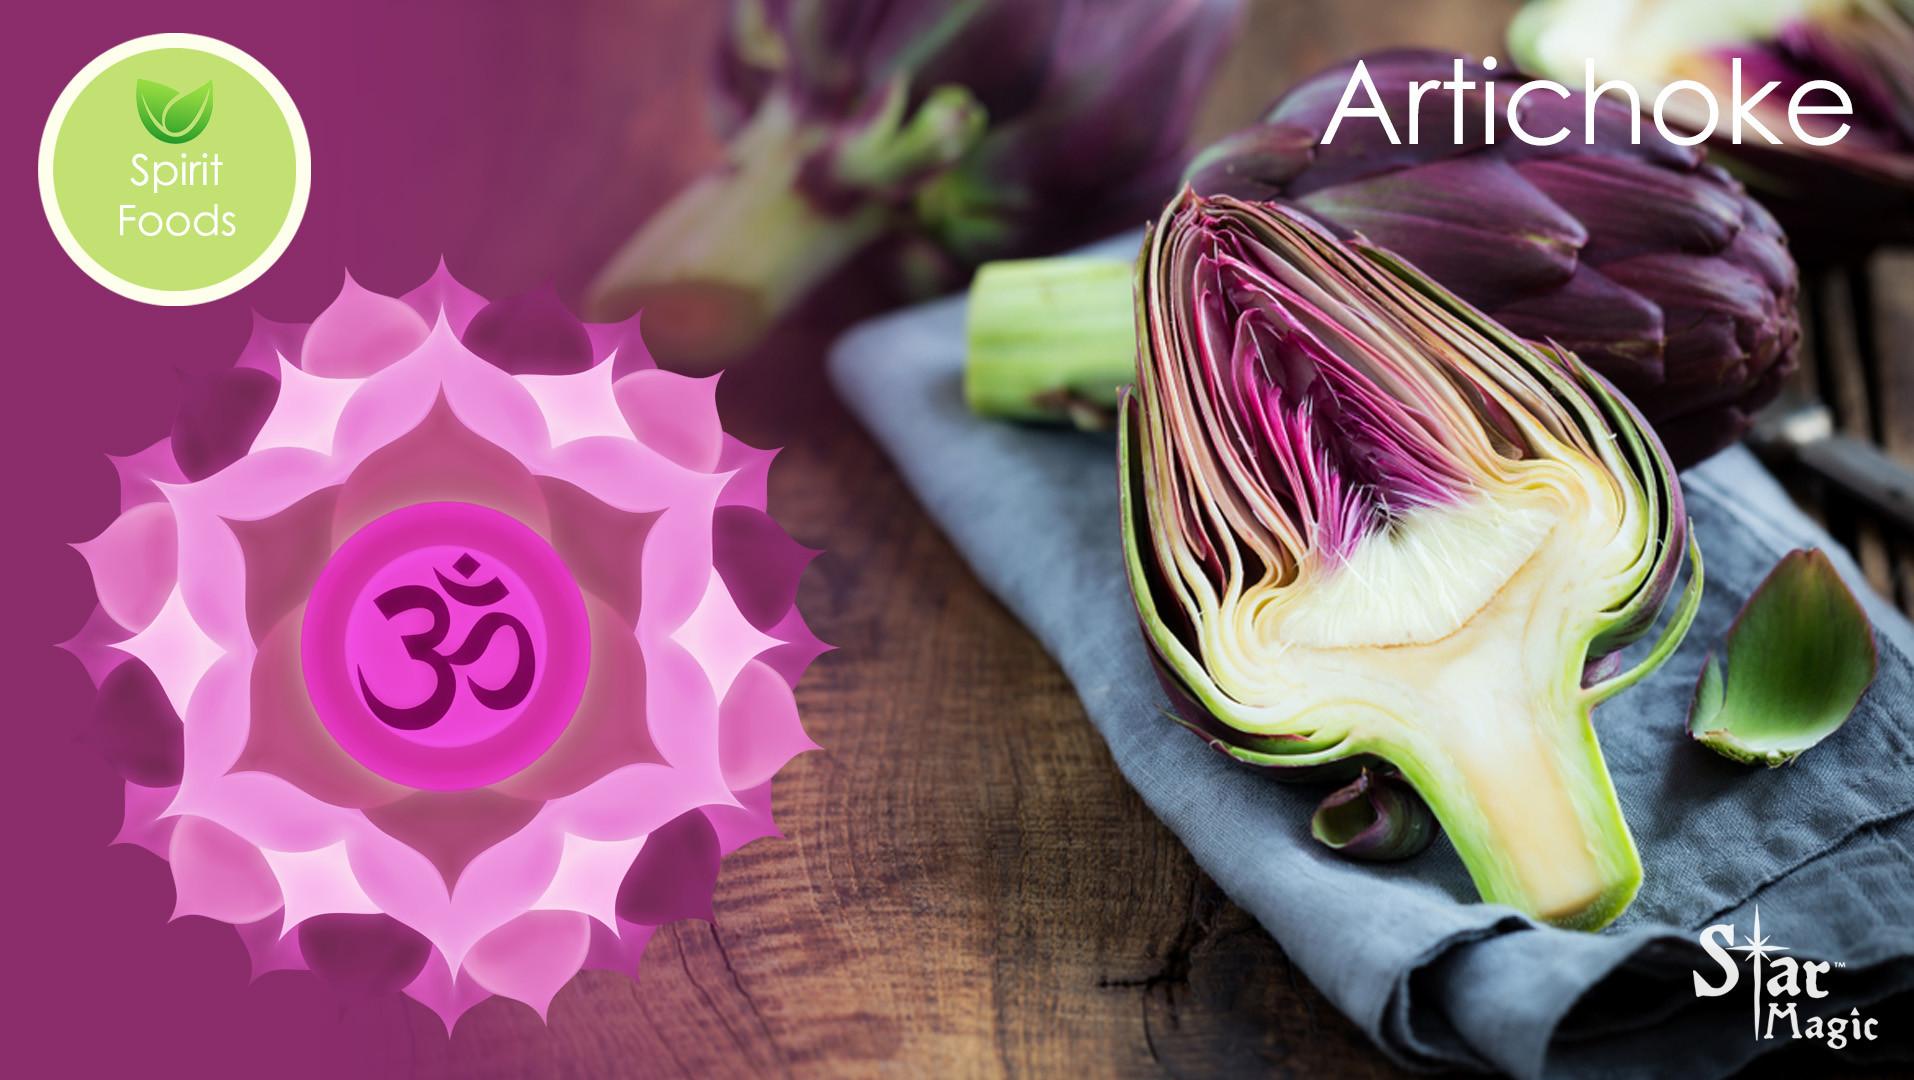 Spirit Food – Artichoke